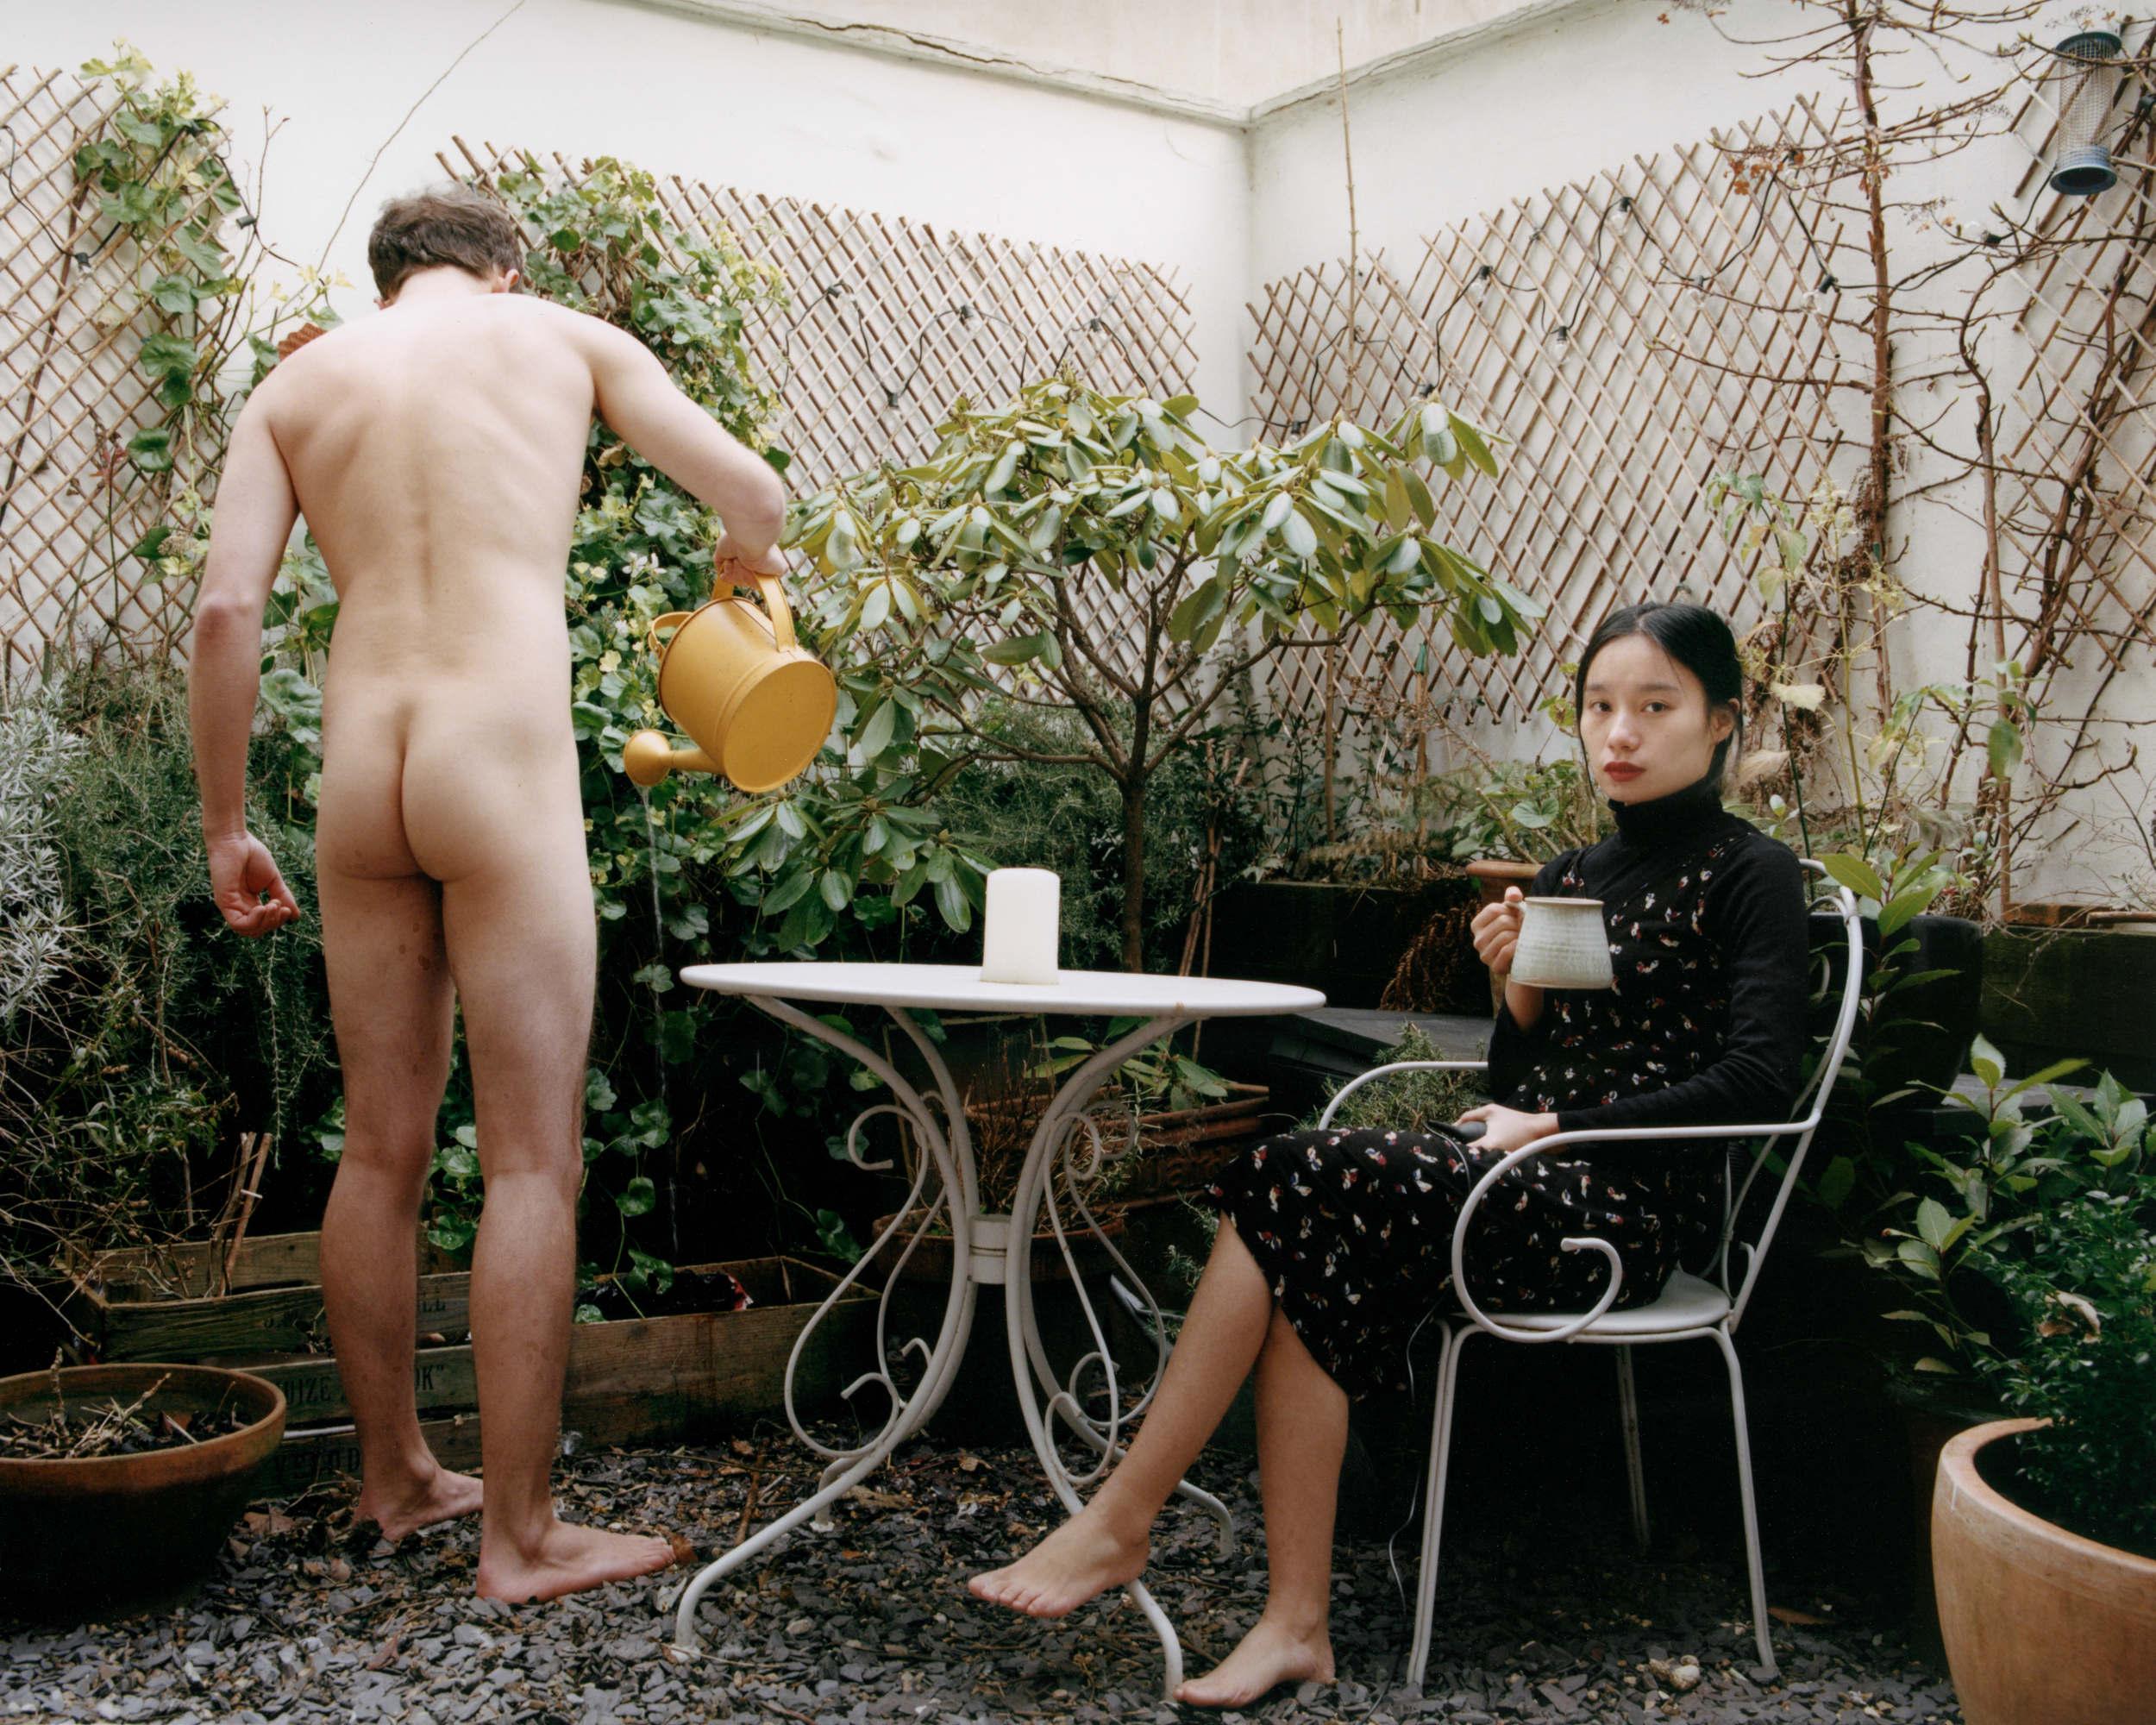 Знакомства для секса садовой знакомства для секса г шуя